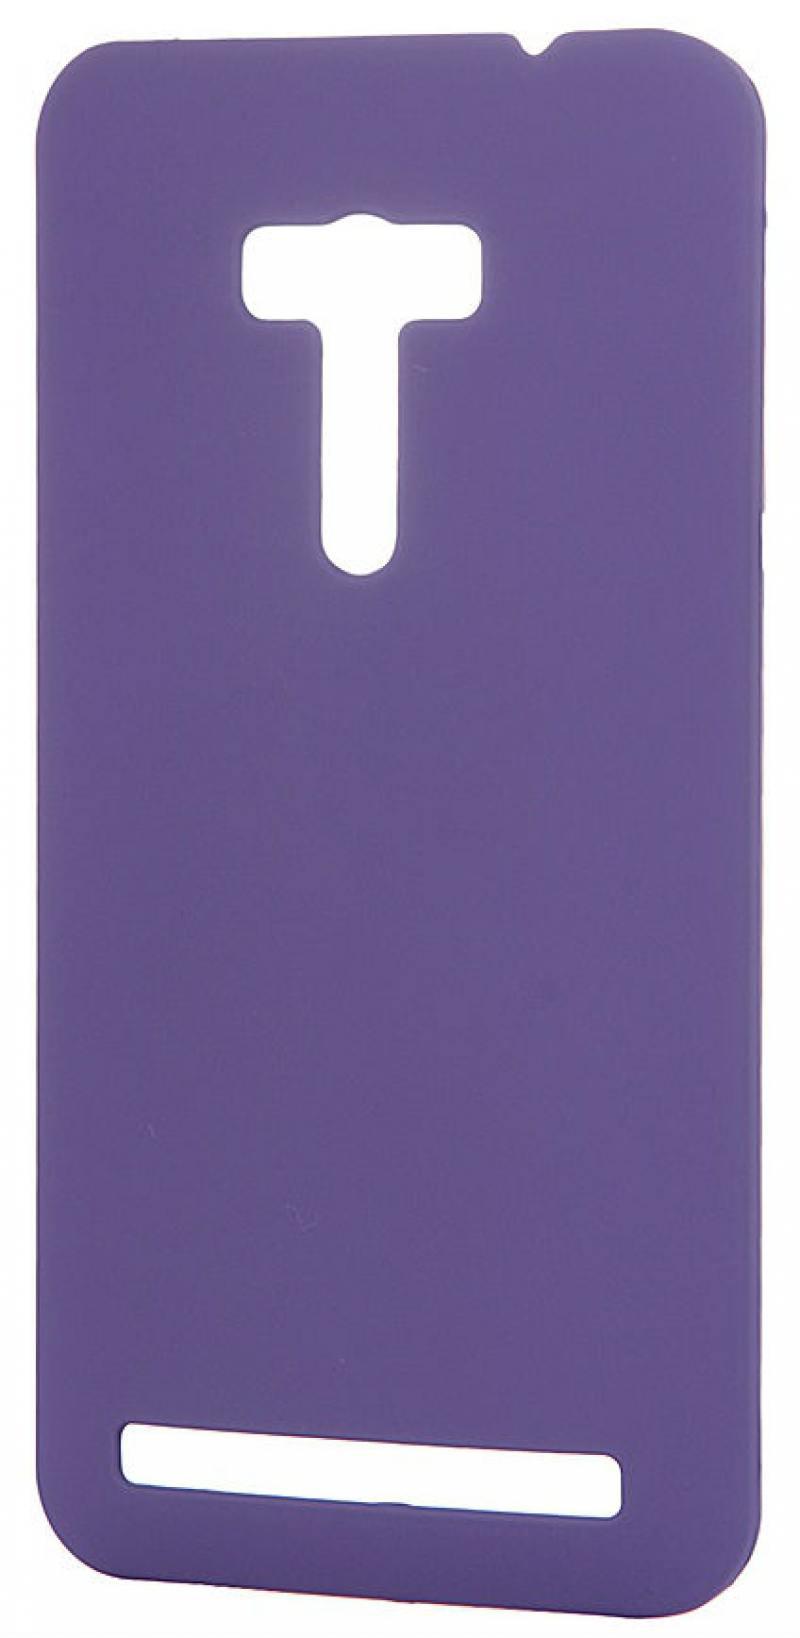 Чехол-накладка для Asus Zenfone Selfie ZD551KL Pulsar CLIPCASE PC Soft-Touch РСС0150 Blue клип-кейс, пластик asus zenfone selfie zd551kl 16gb pink 1i125ru